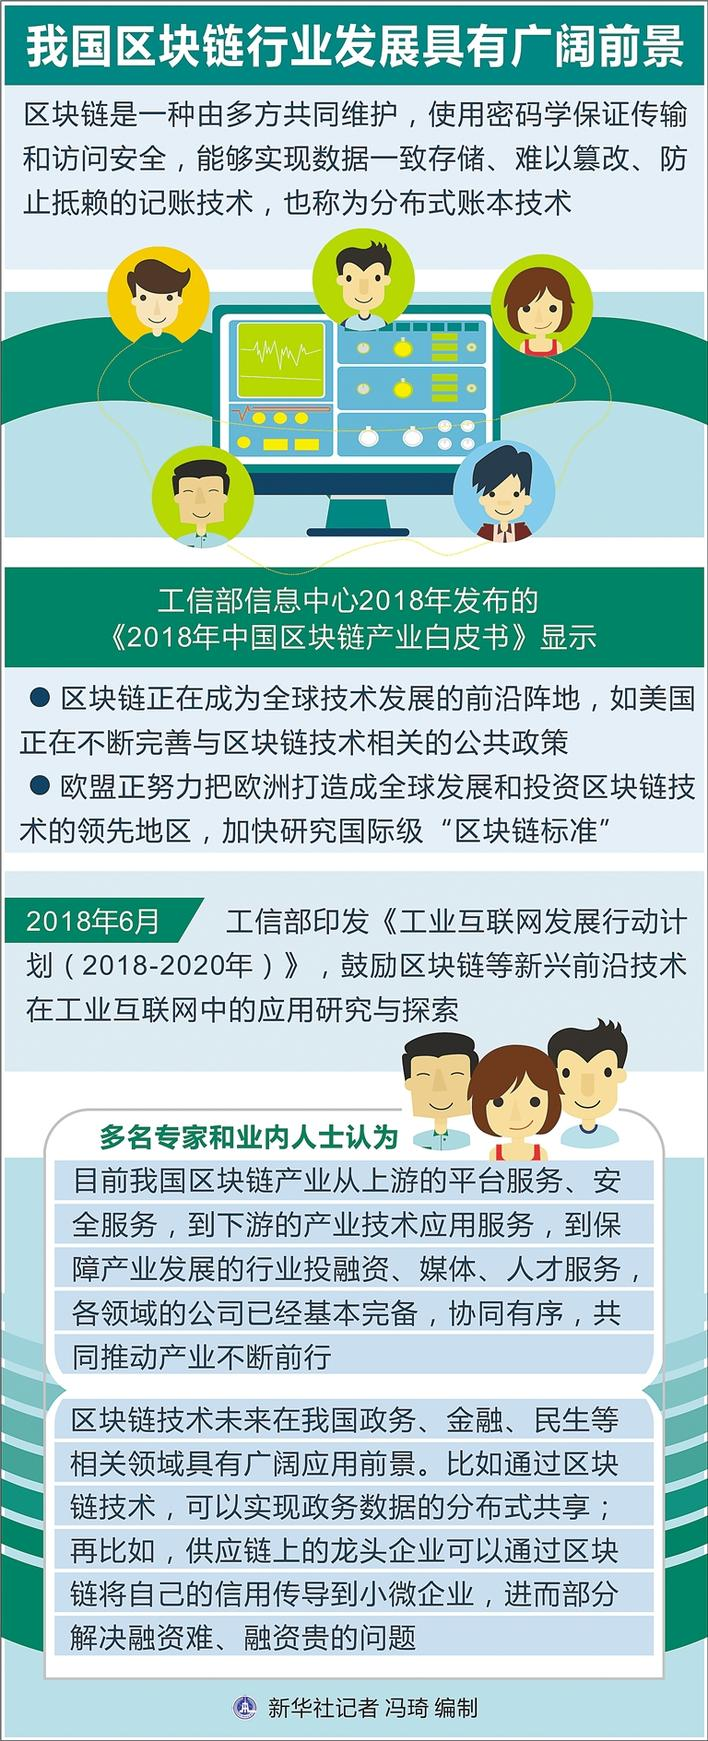 http://www.reviewcode.cn/shujuku/87568.html